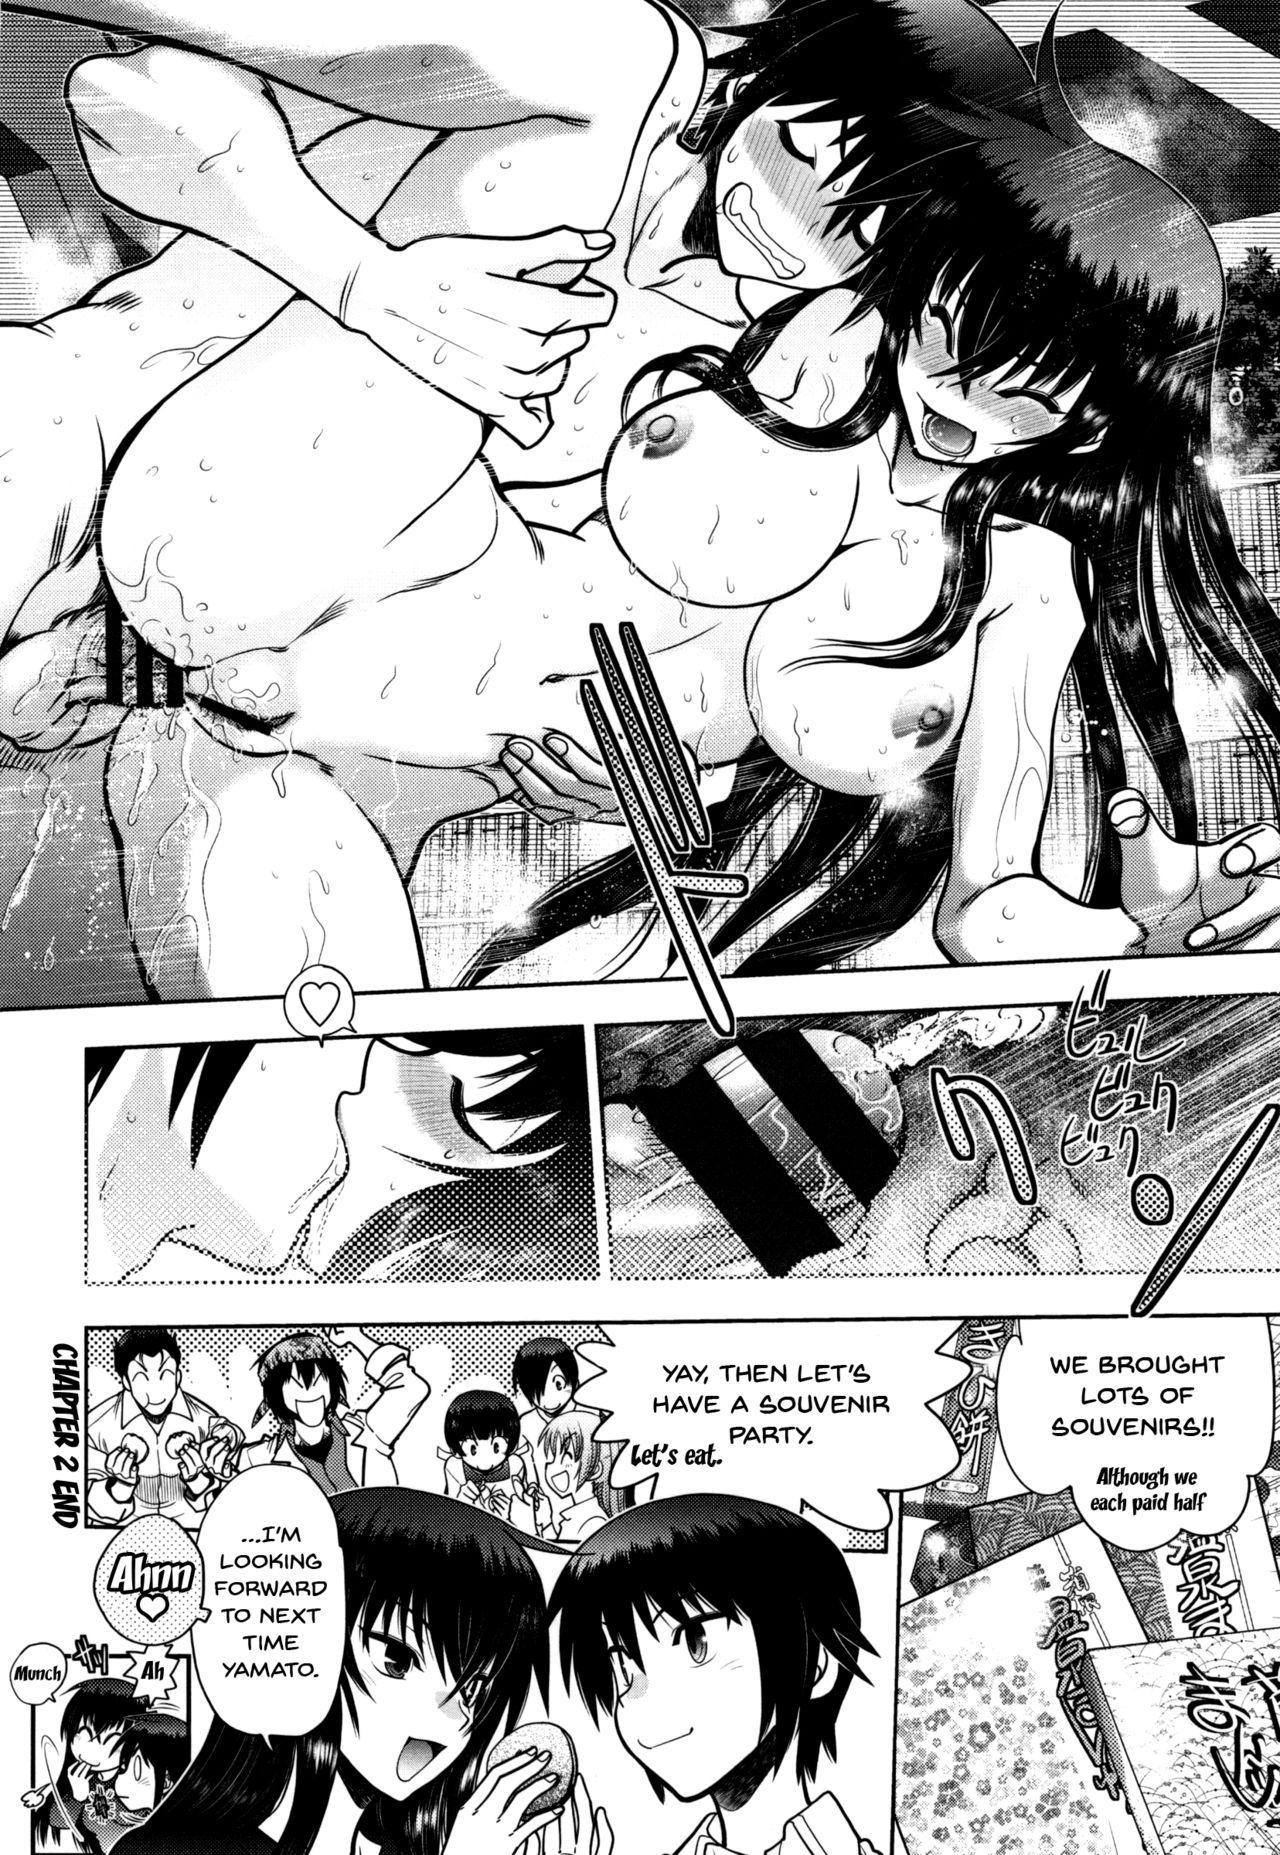 [Yagami Dai] Maji de Watashi ni Koi Shinasai! S Adult Edition ~Shodai Heroine Hen~ | Fall in Love With Me For Real! Ch.1-8 [English] {Doujins.com} 44